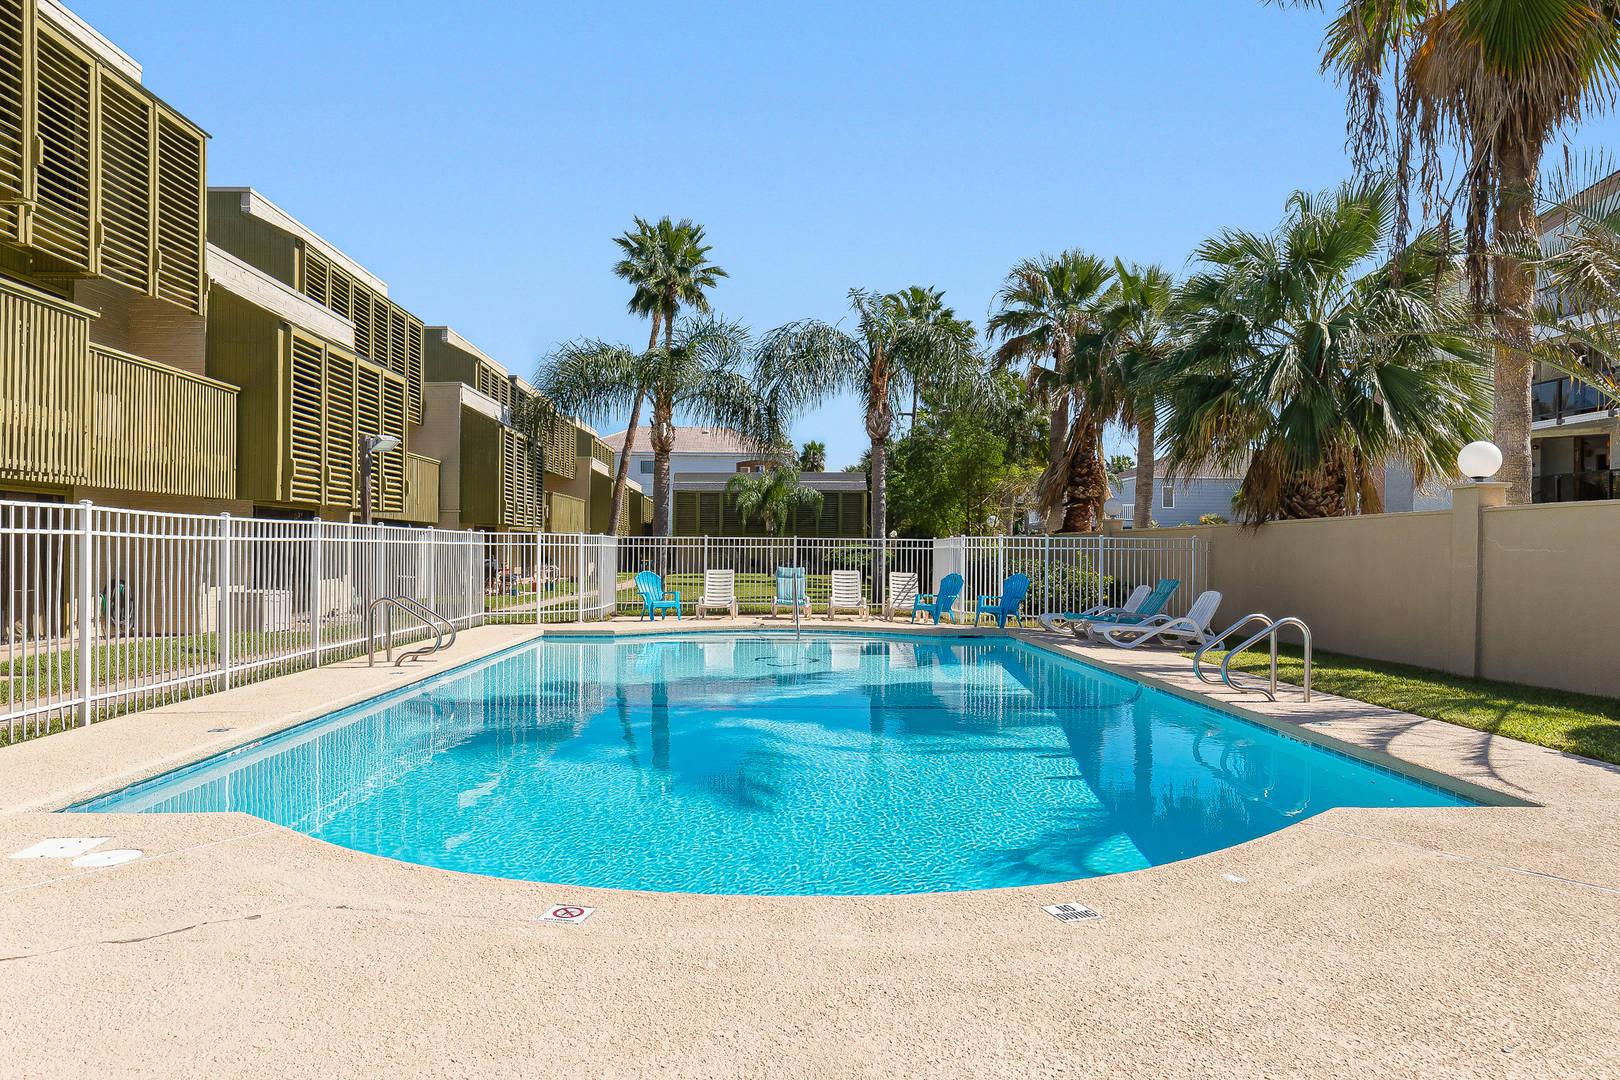 227 W Morningside Dr. #214  South Padre Island, TX 78597